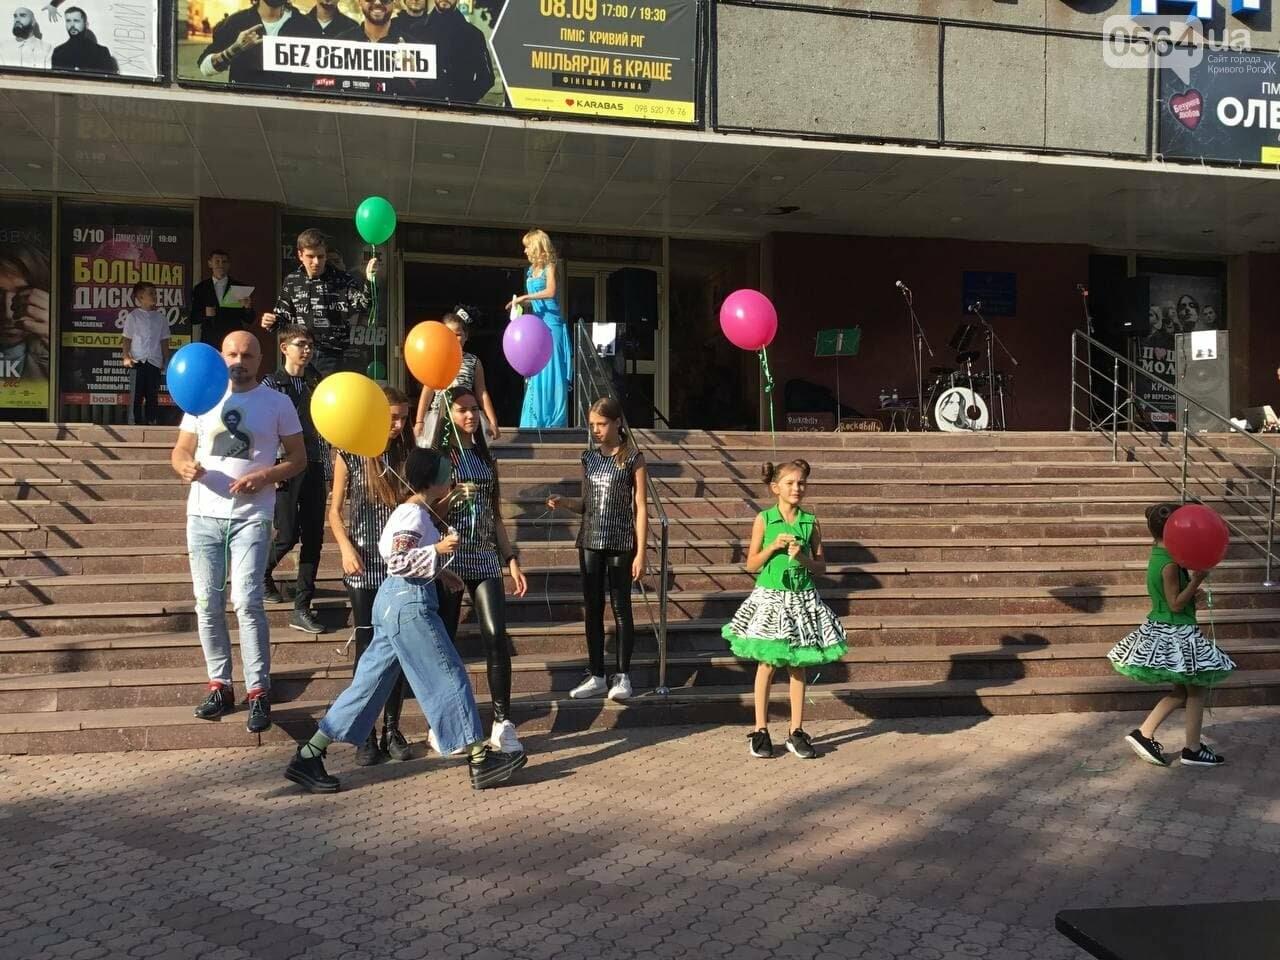 18 конкурсантов представили своё творчество на 5-м Криворожском фестивале имени Кузьмы Скрябина, - ФОТО, ВИДЕО, фото-7